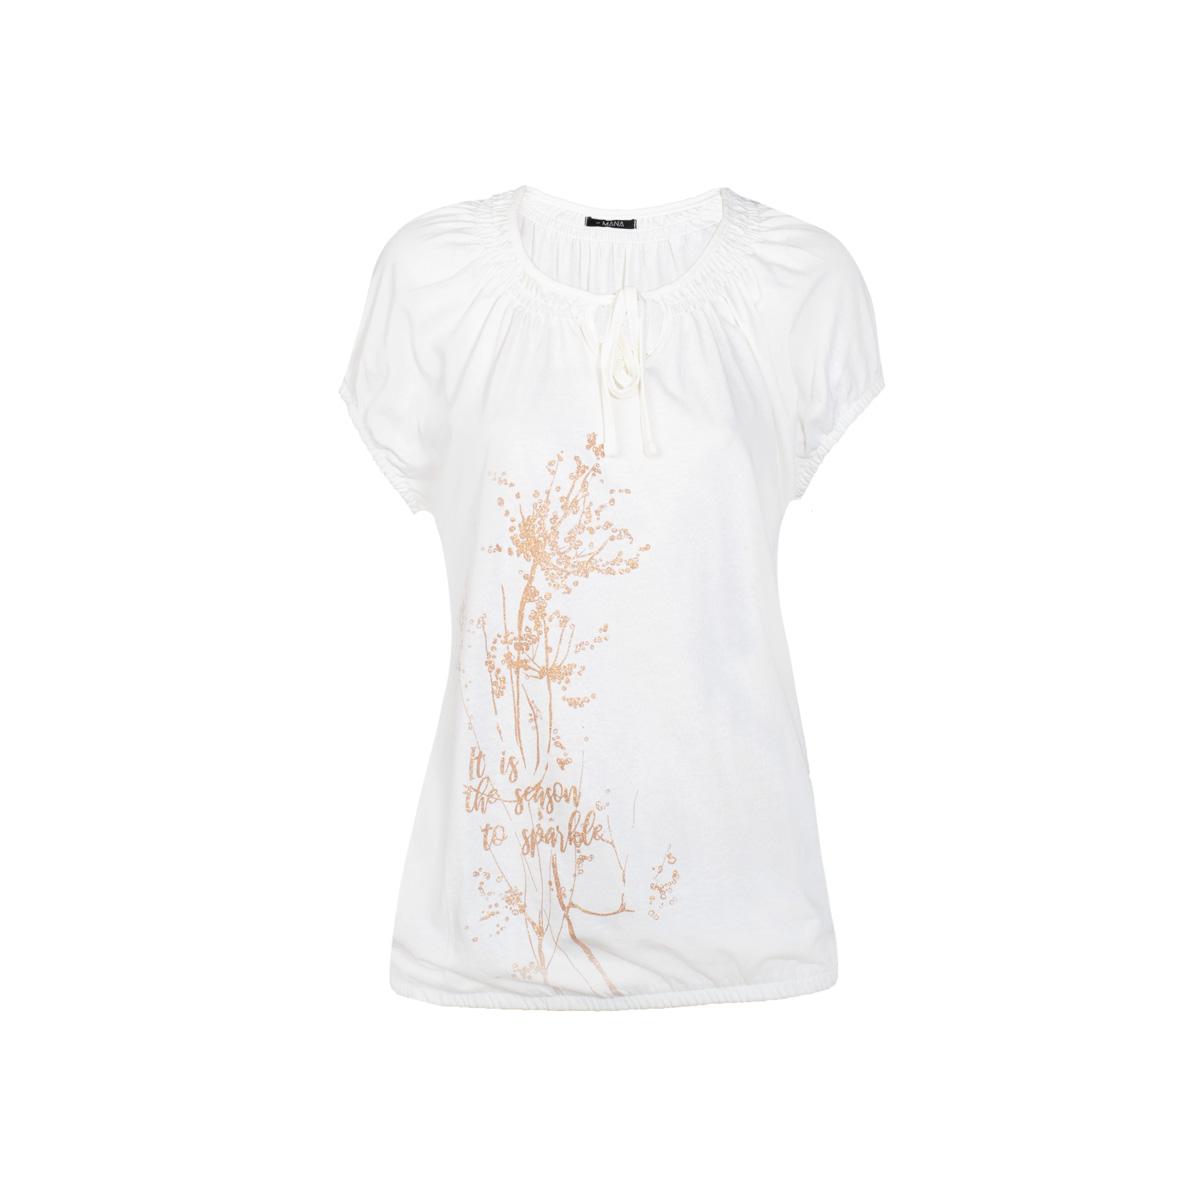 Ženska majica, umazano bela